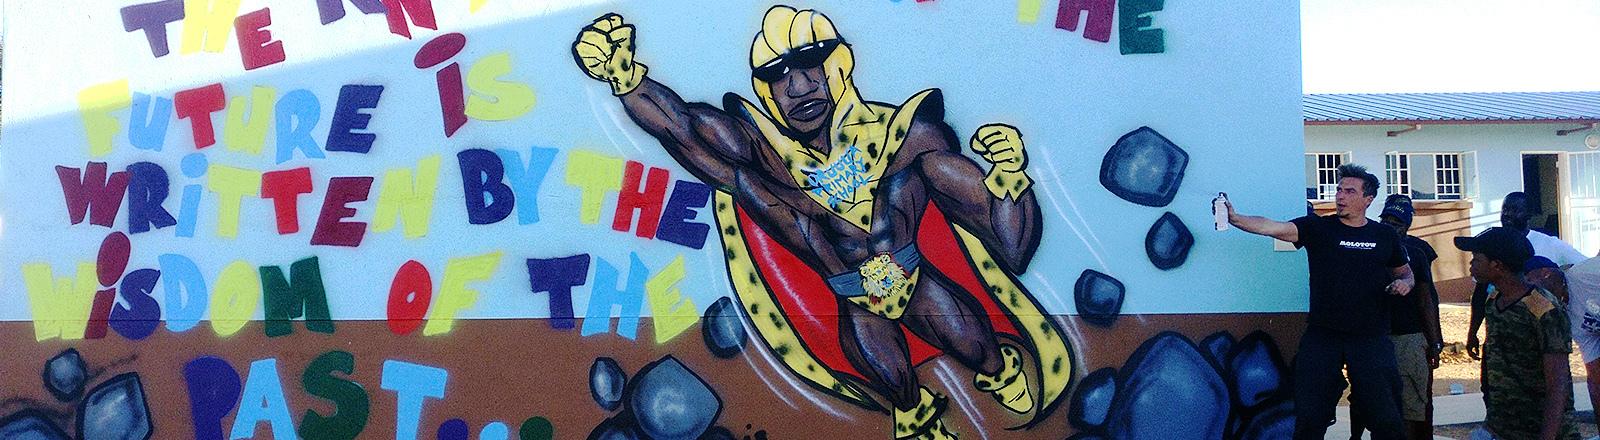 Mann hält eine Sprühdose an ein Superheld-Graffiti.